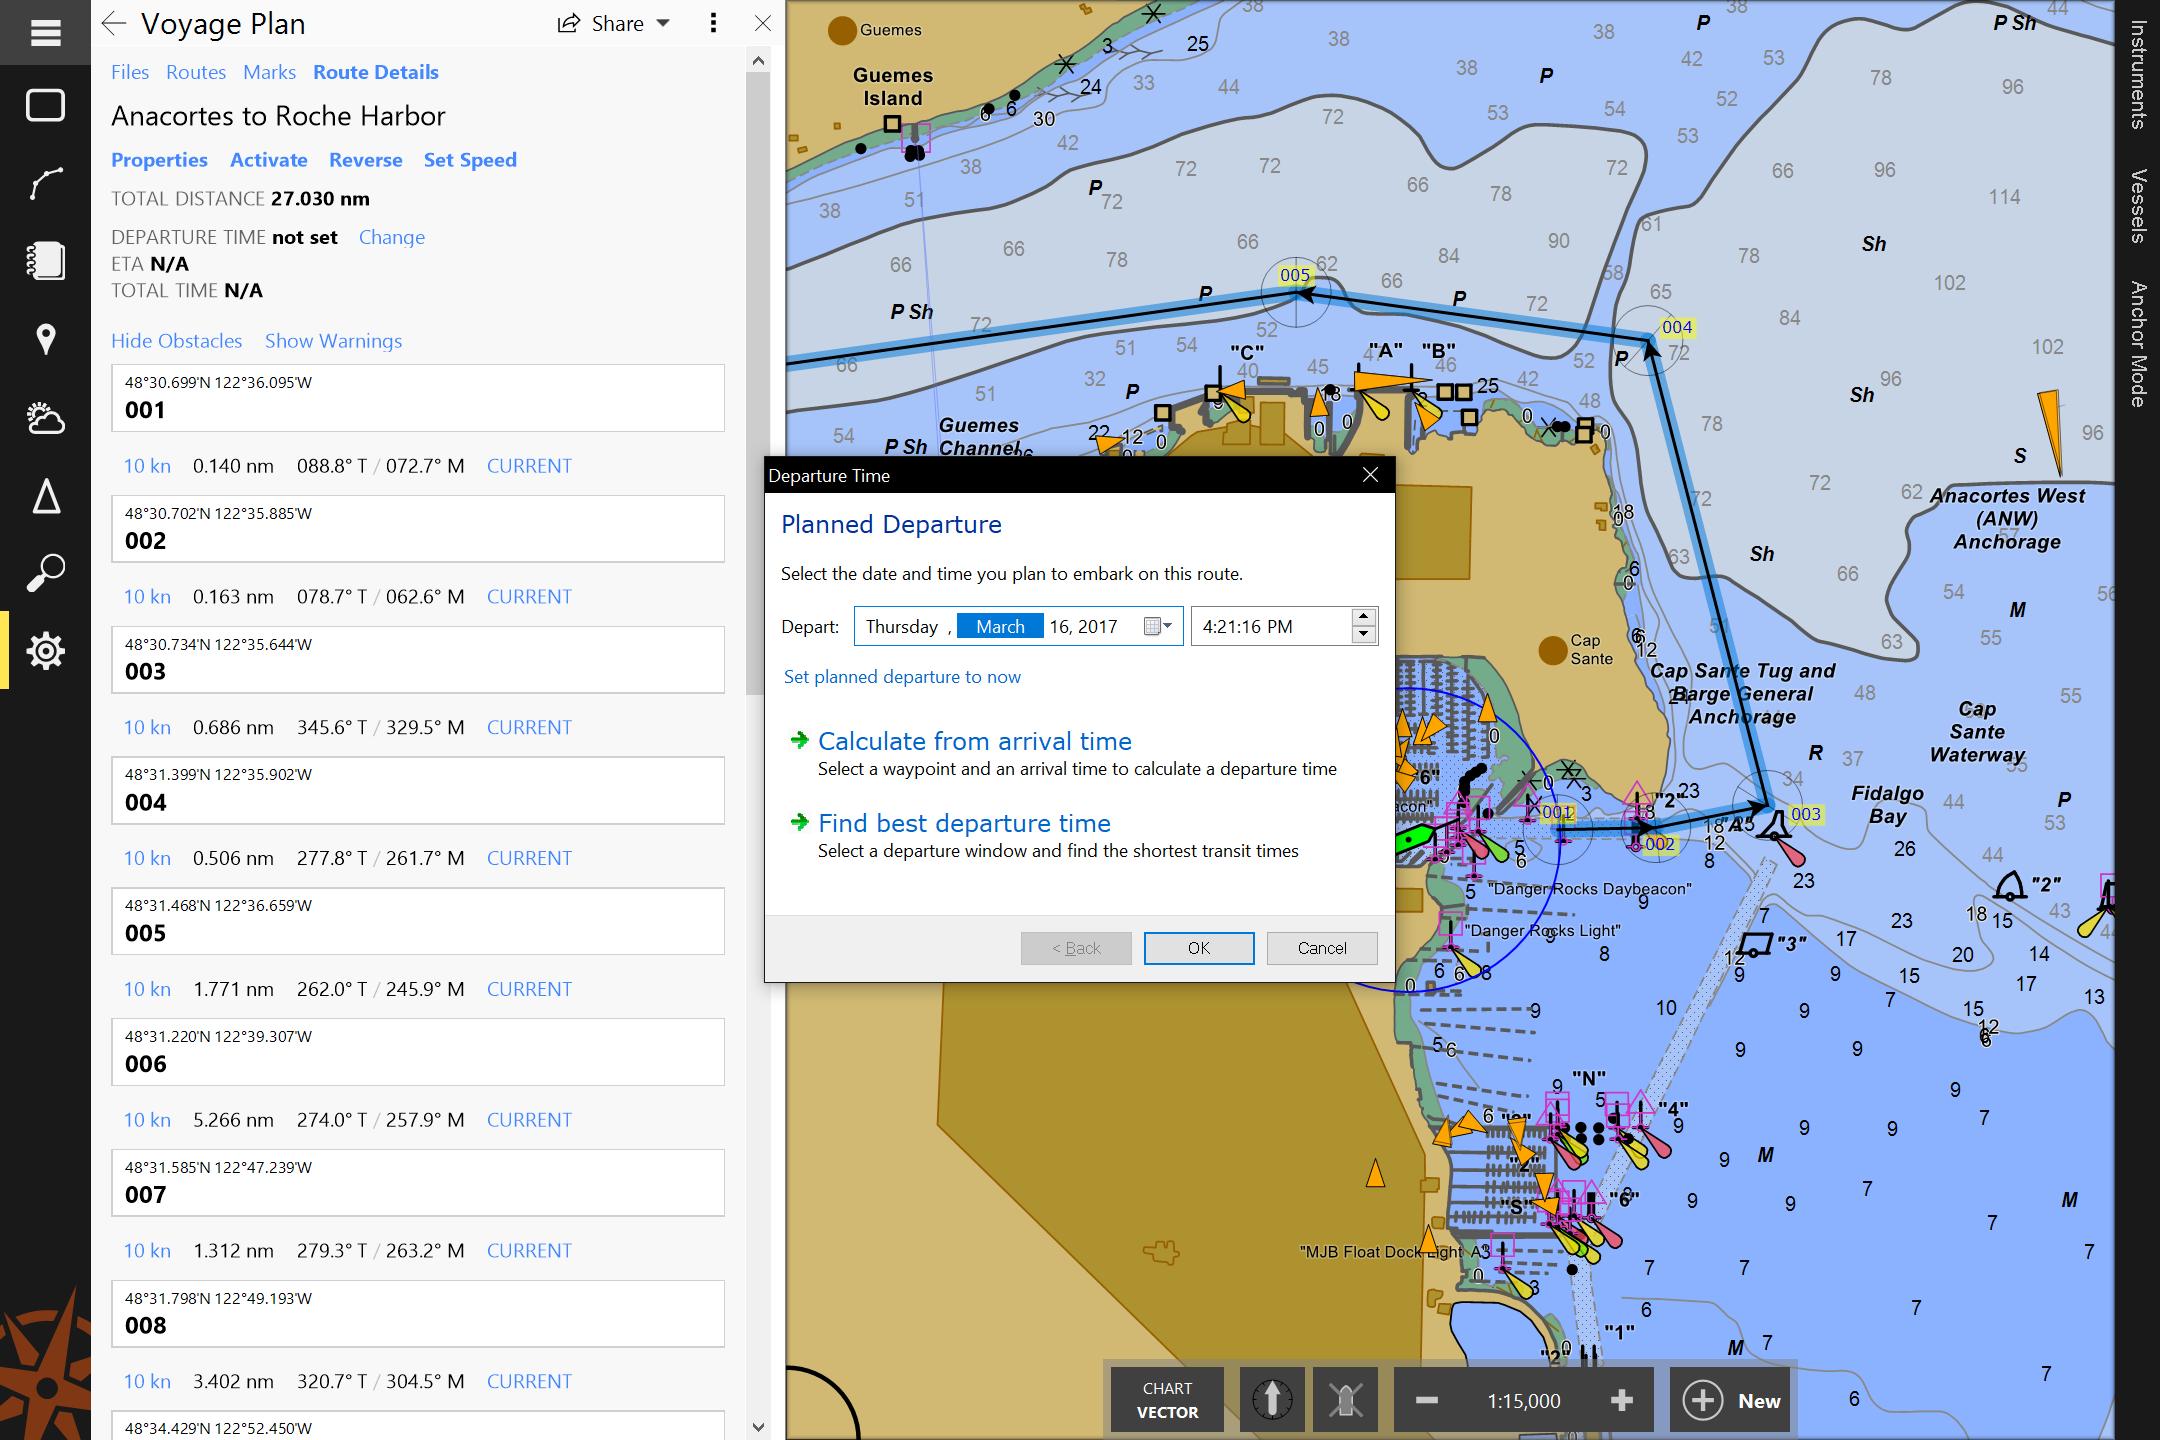 Rose Point Navigation Systems -- Marine Navigation Software